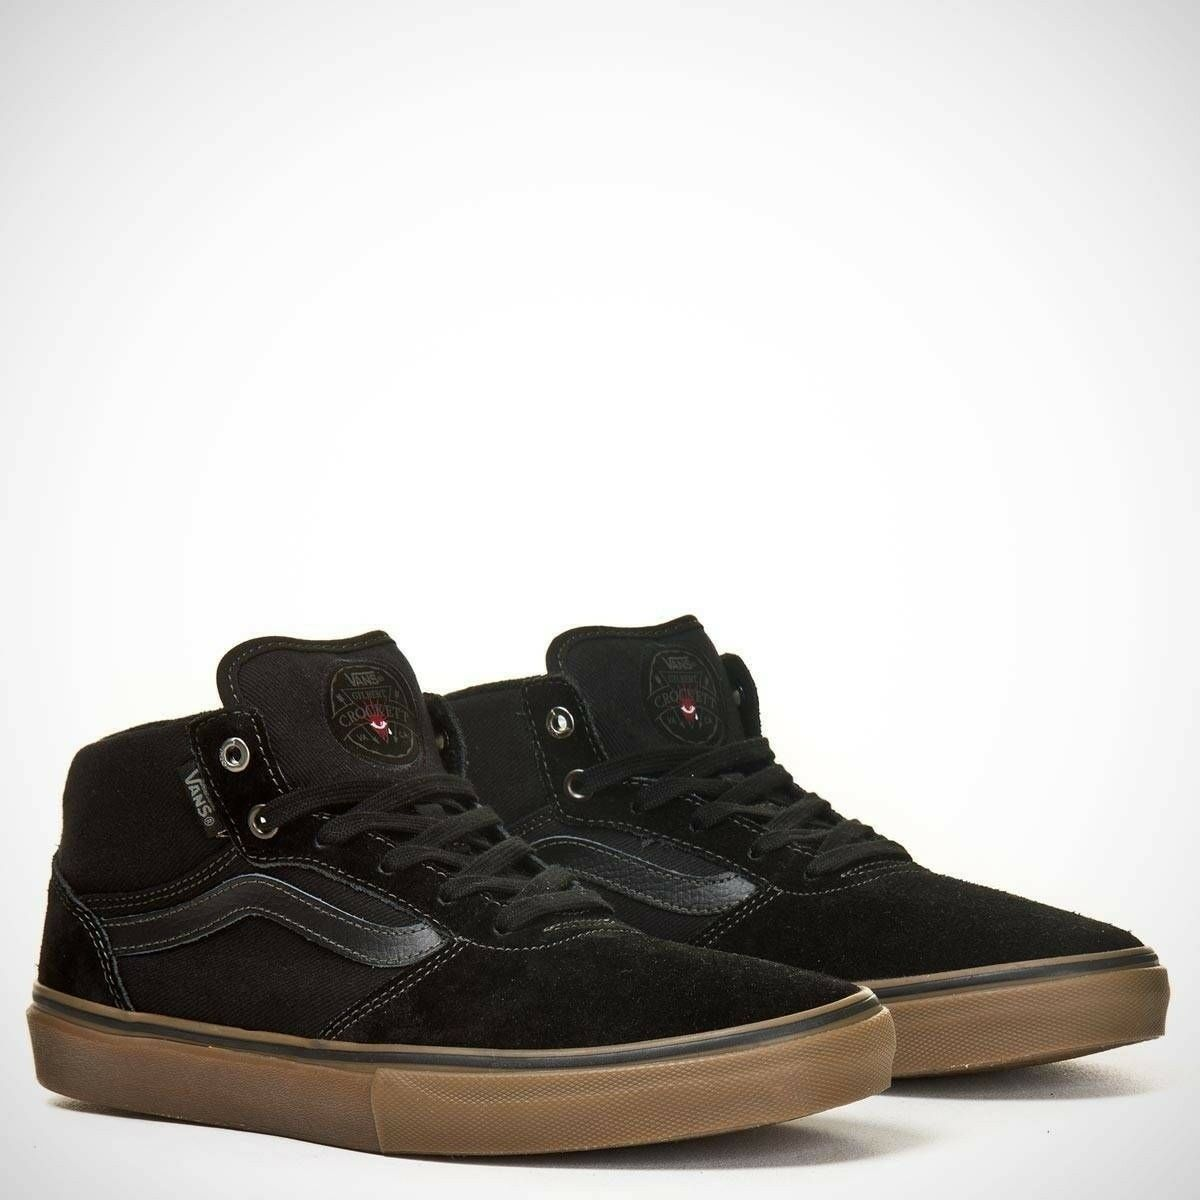 VANS Gilbert Crockett Pro Mid noir /Gum Skate Chaussures hommes 6.5 femmes 8